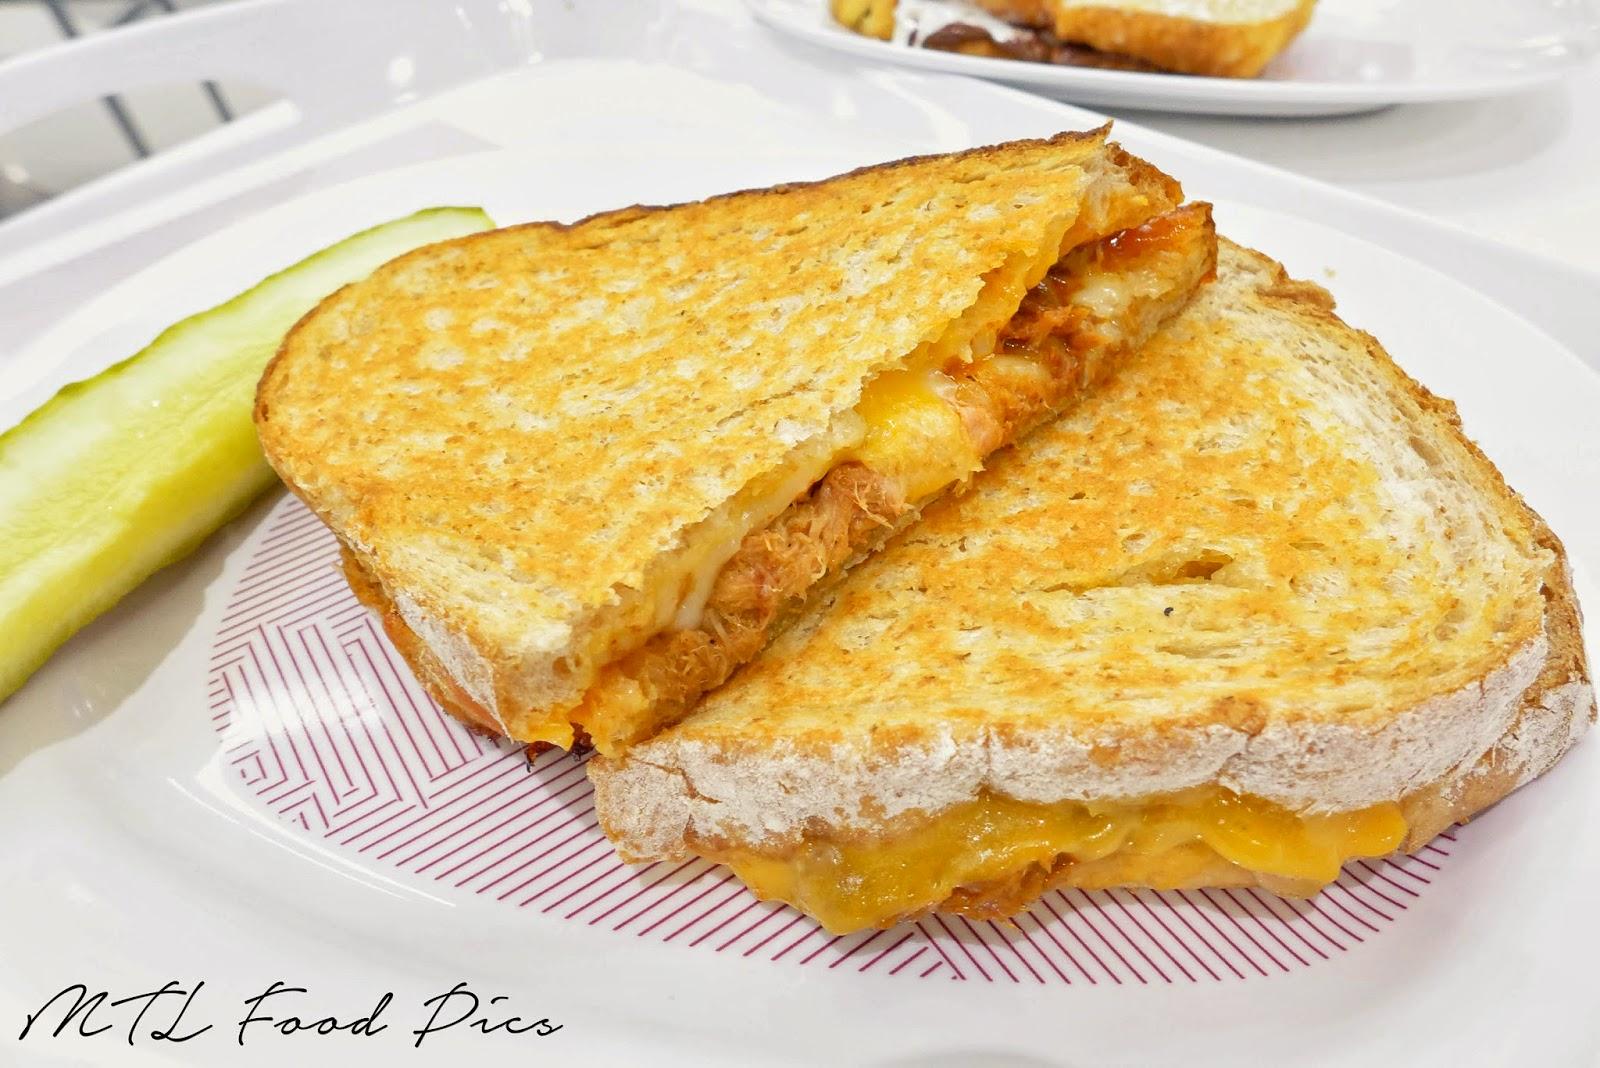 MLT DWN - Pulled Pork Grilled Cheese Sandwich